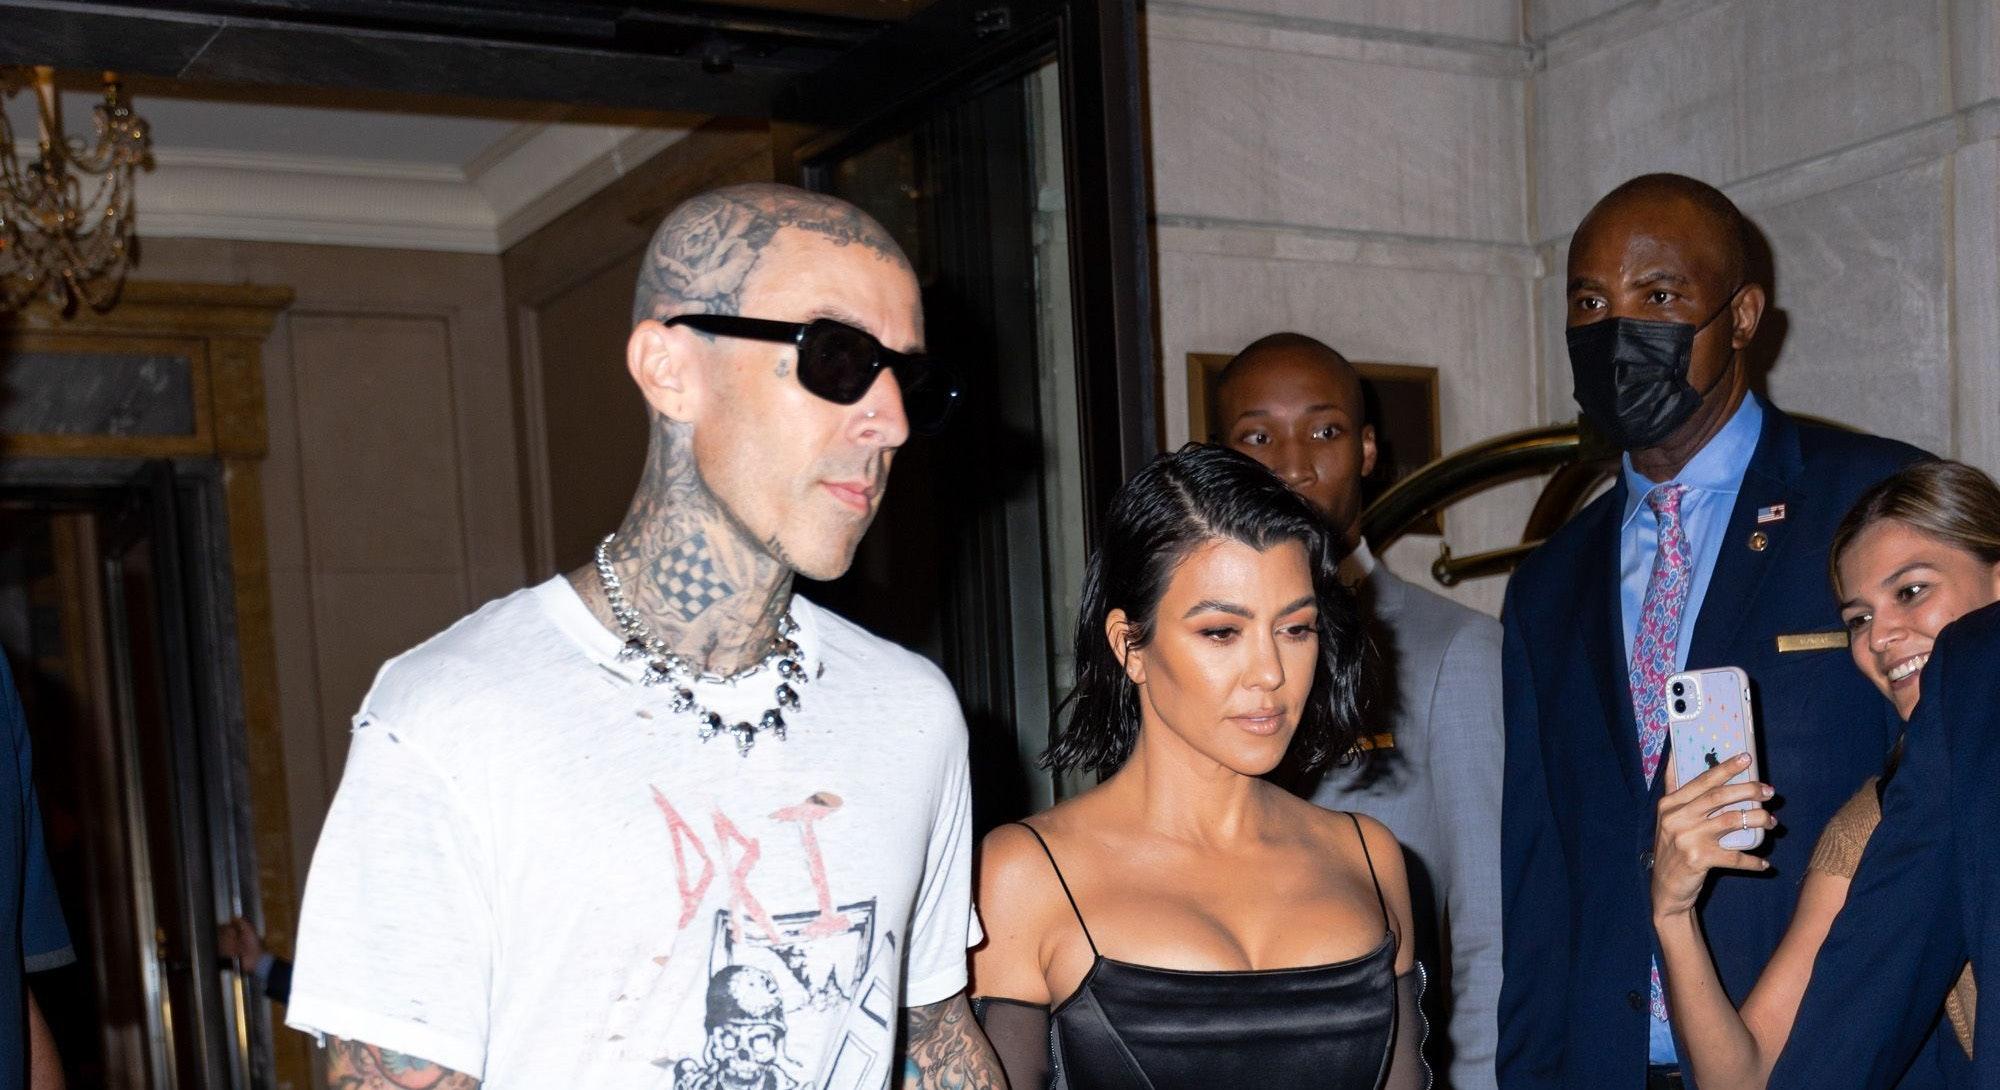 NEW YORK, NEW YORK - SEPTEMBER 11: Travis Barker (L) and Kourtney Kardashian are seen in Midtown on ...